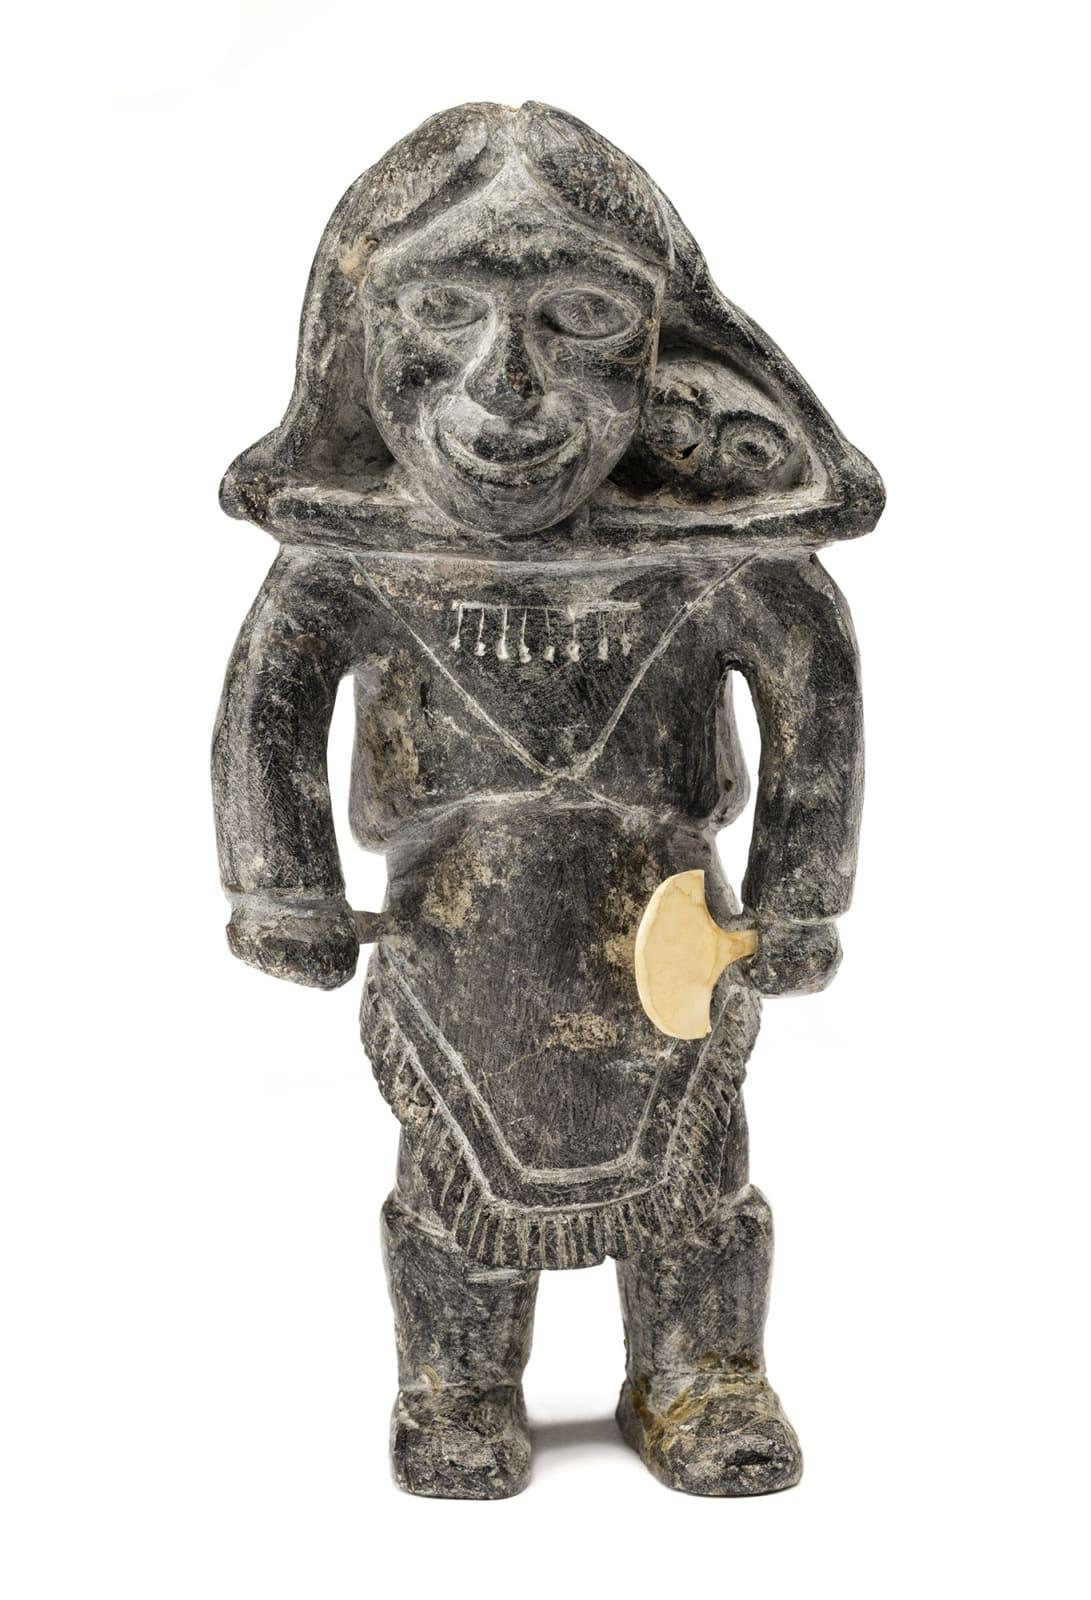 Lot 47 JOE TALIRUNILI (1893-1976) PUVIRNITUQ (POVUNGNITUK) Mother With Child in Her Amautiq, c. 1965 stone and ivory, 5.5 x 3 x 2 in (14 x 7.6 x 5.1 cm) Estimate: $2,500 — $3,500 price realized: $5,040